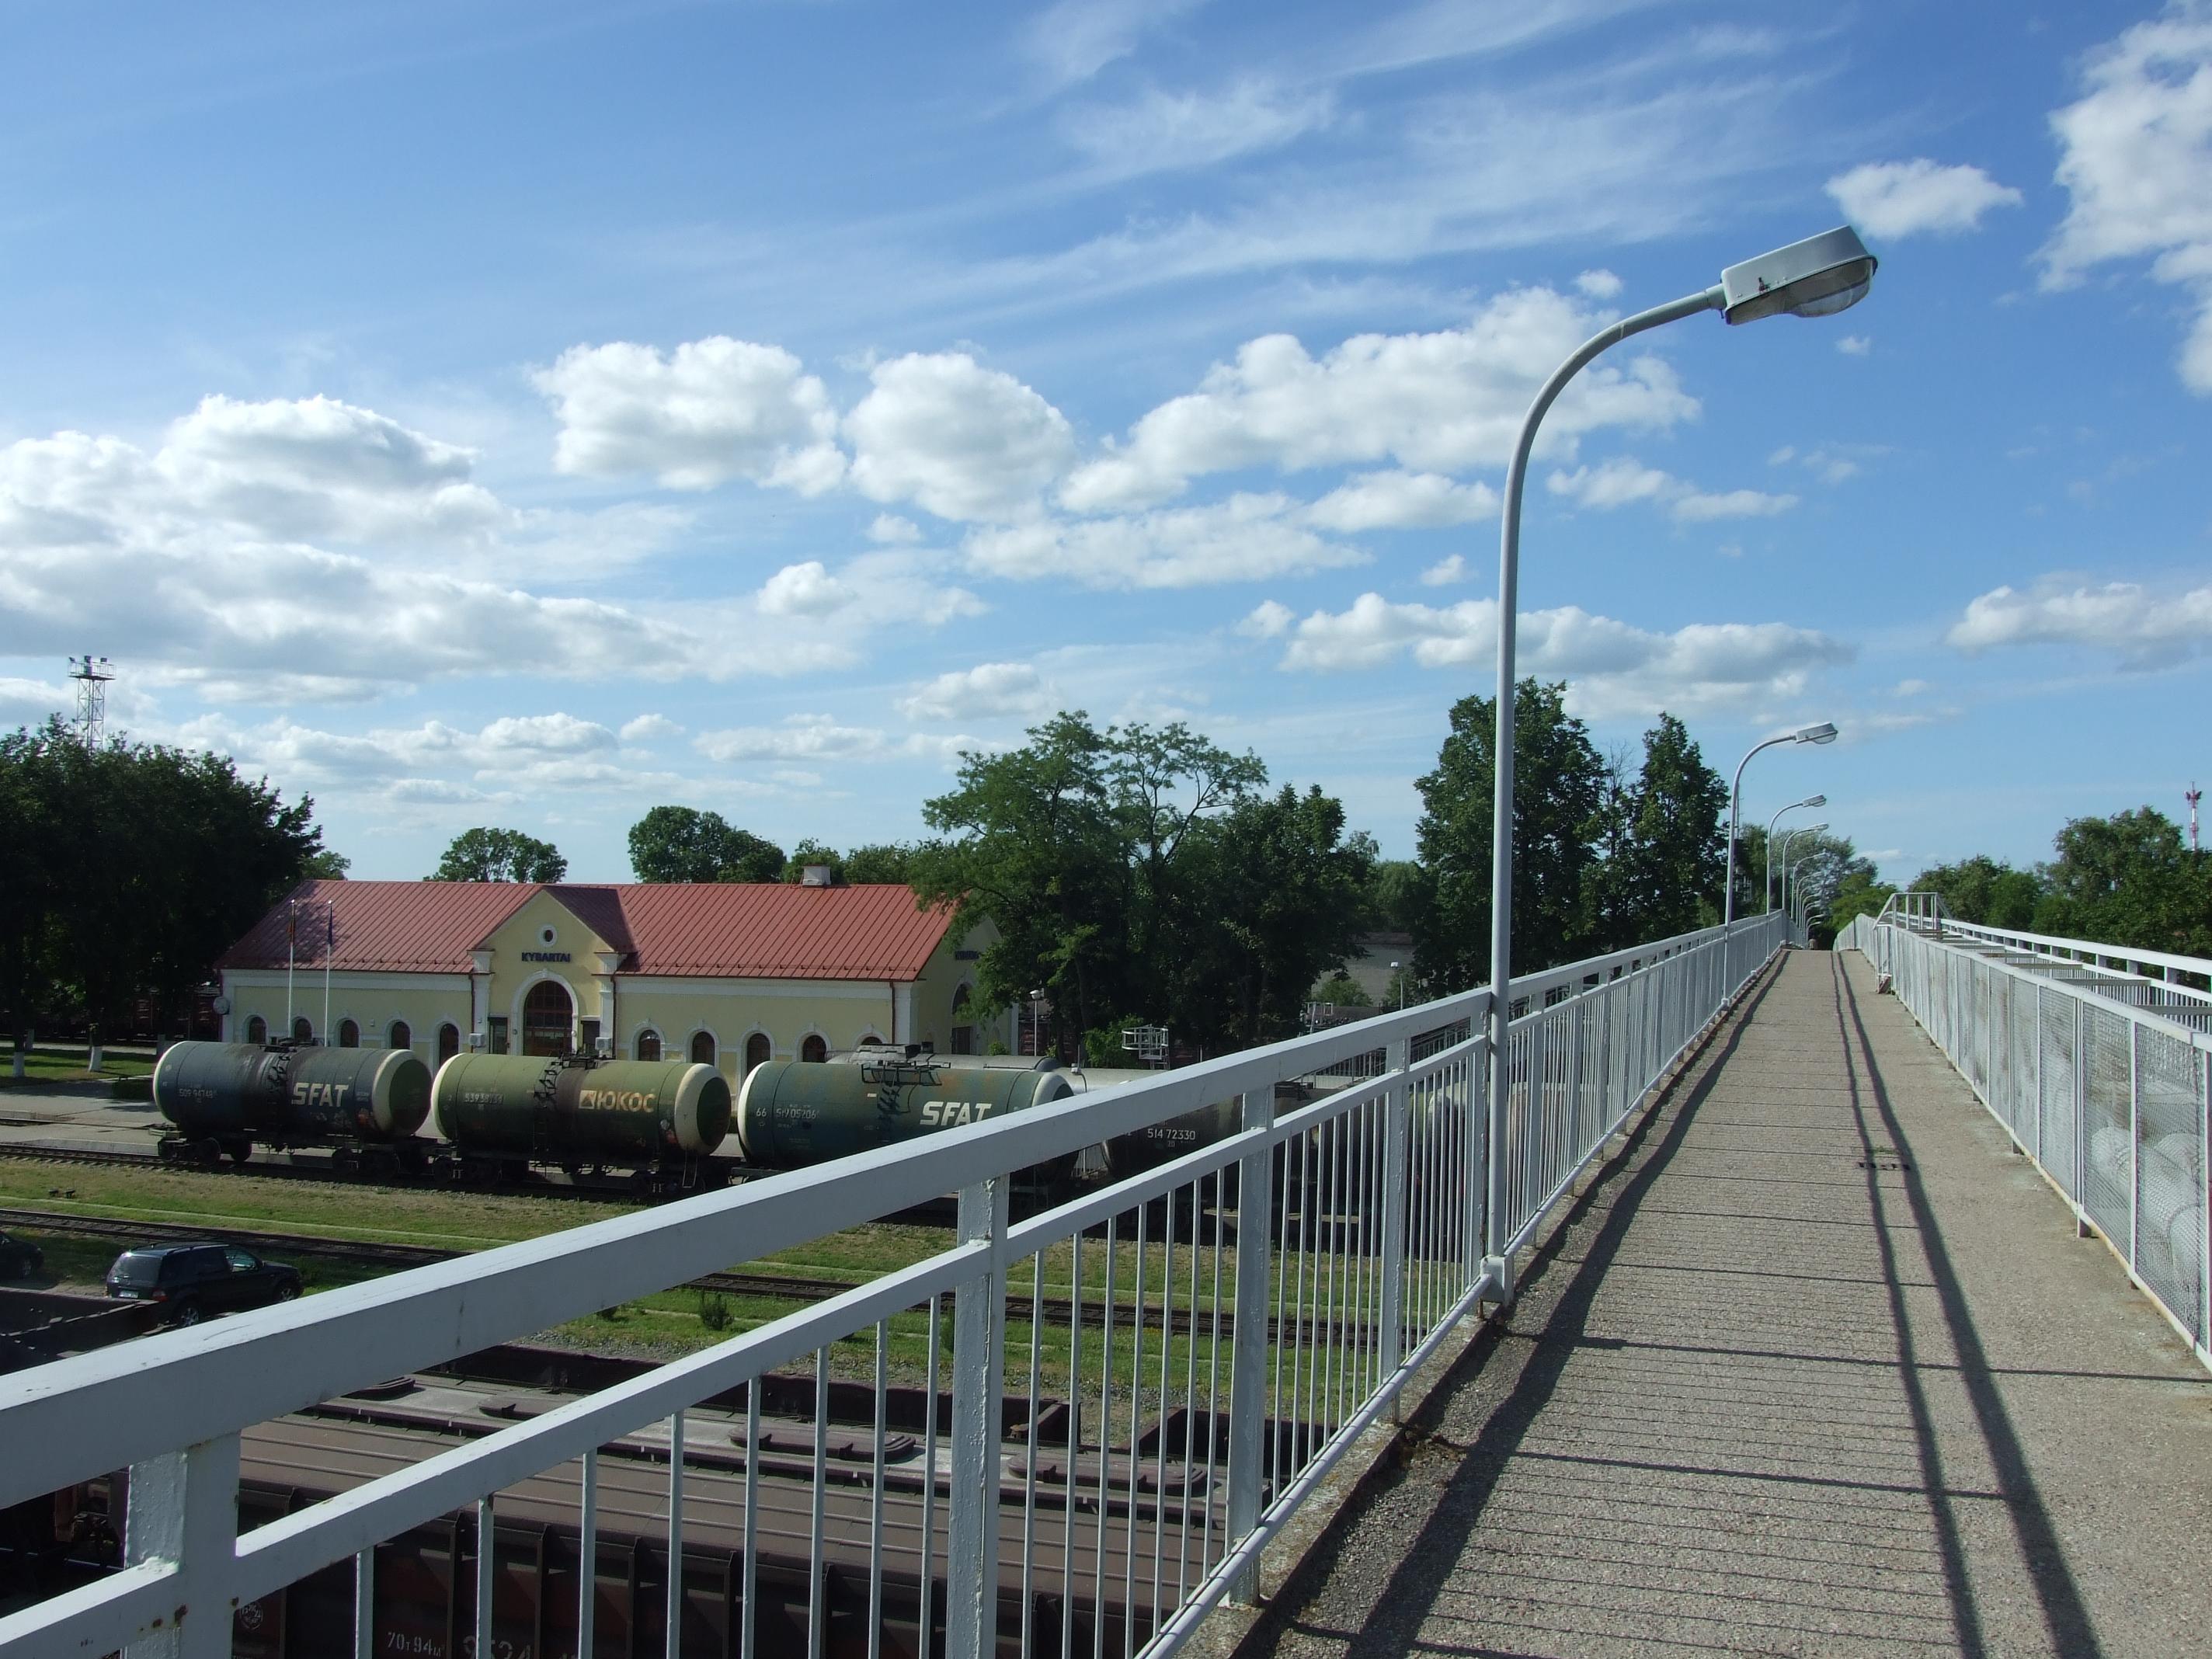 Kybartu gelezinkelio stotis